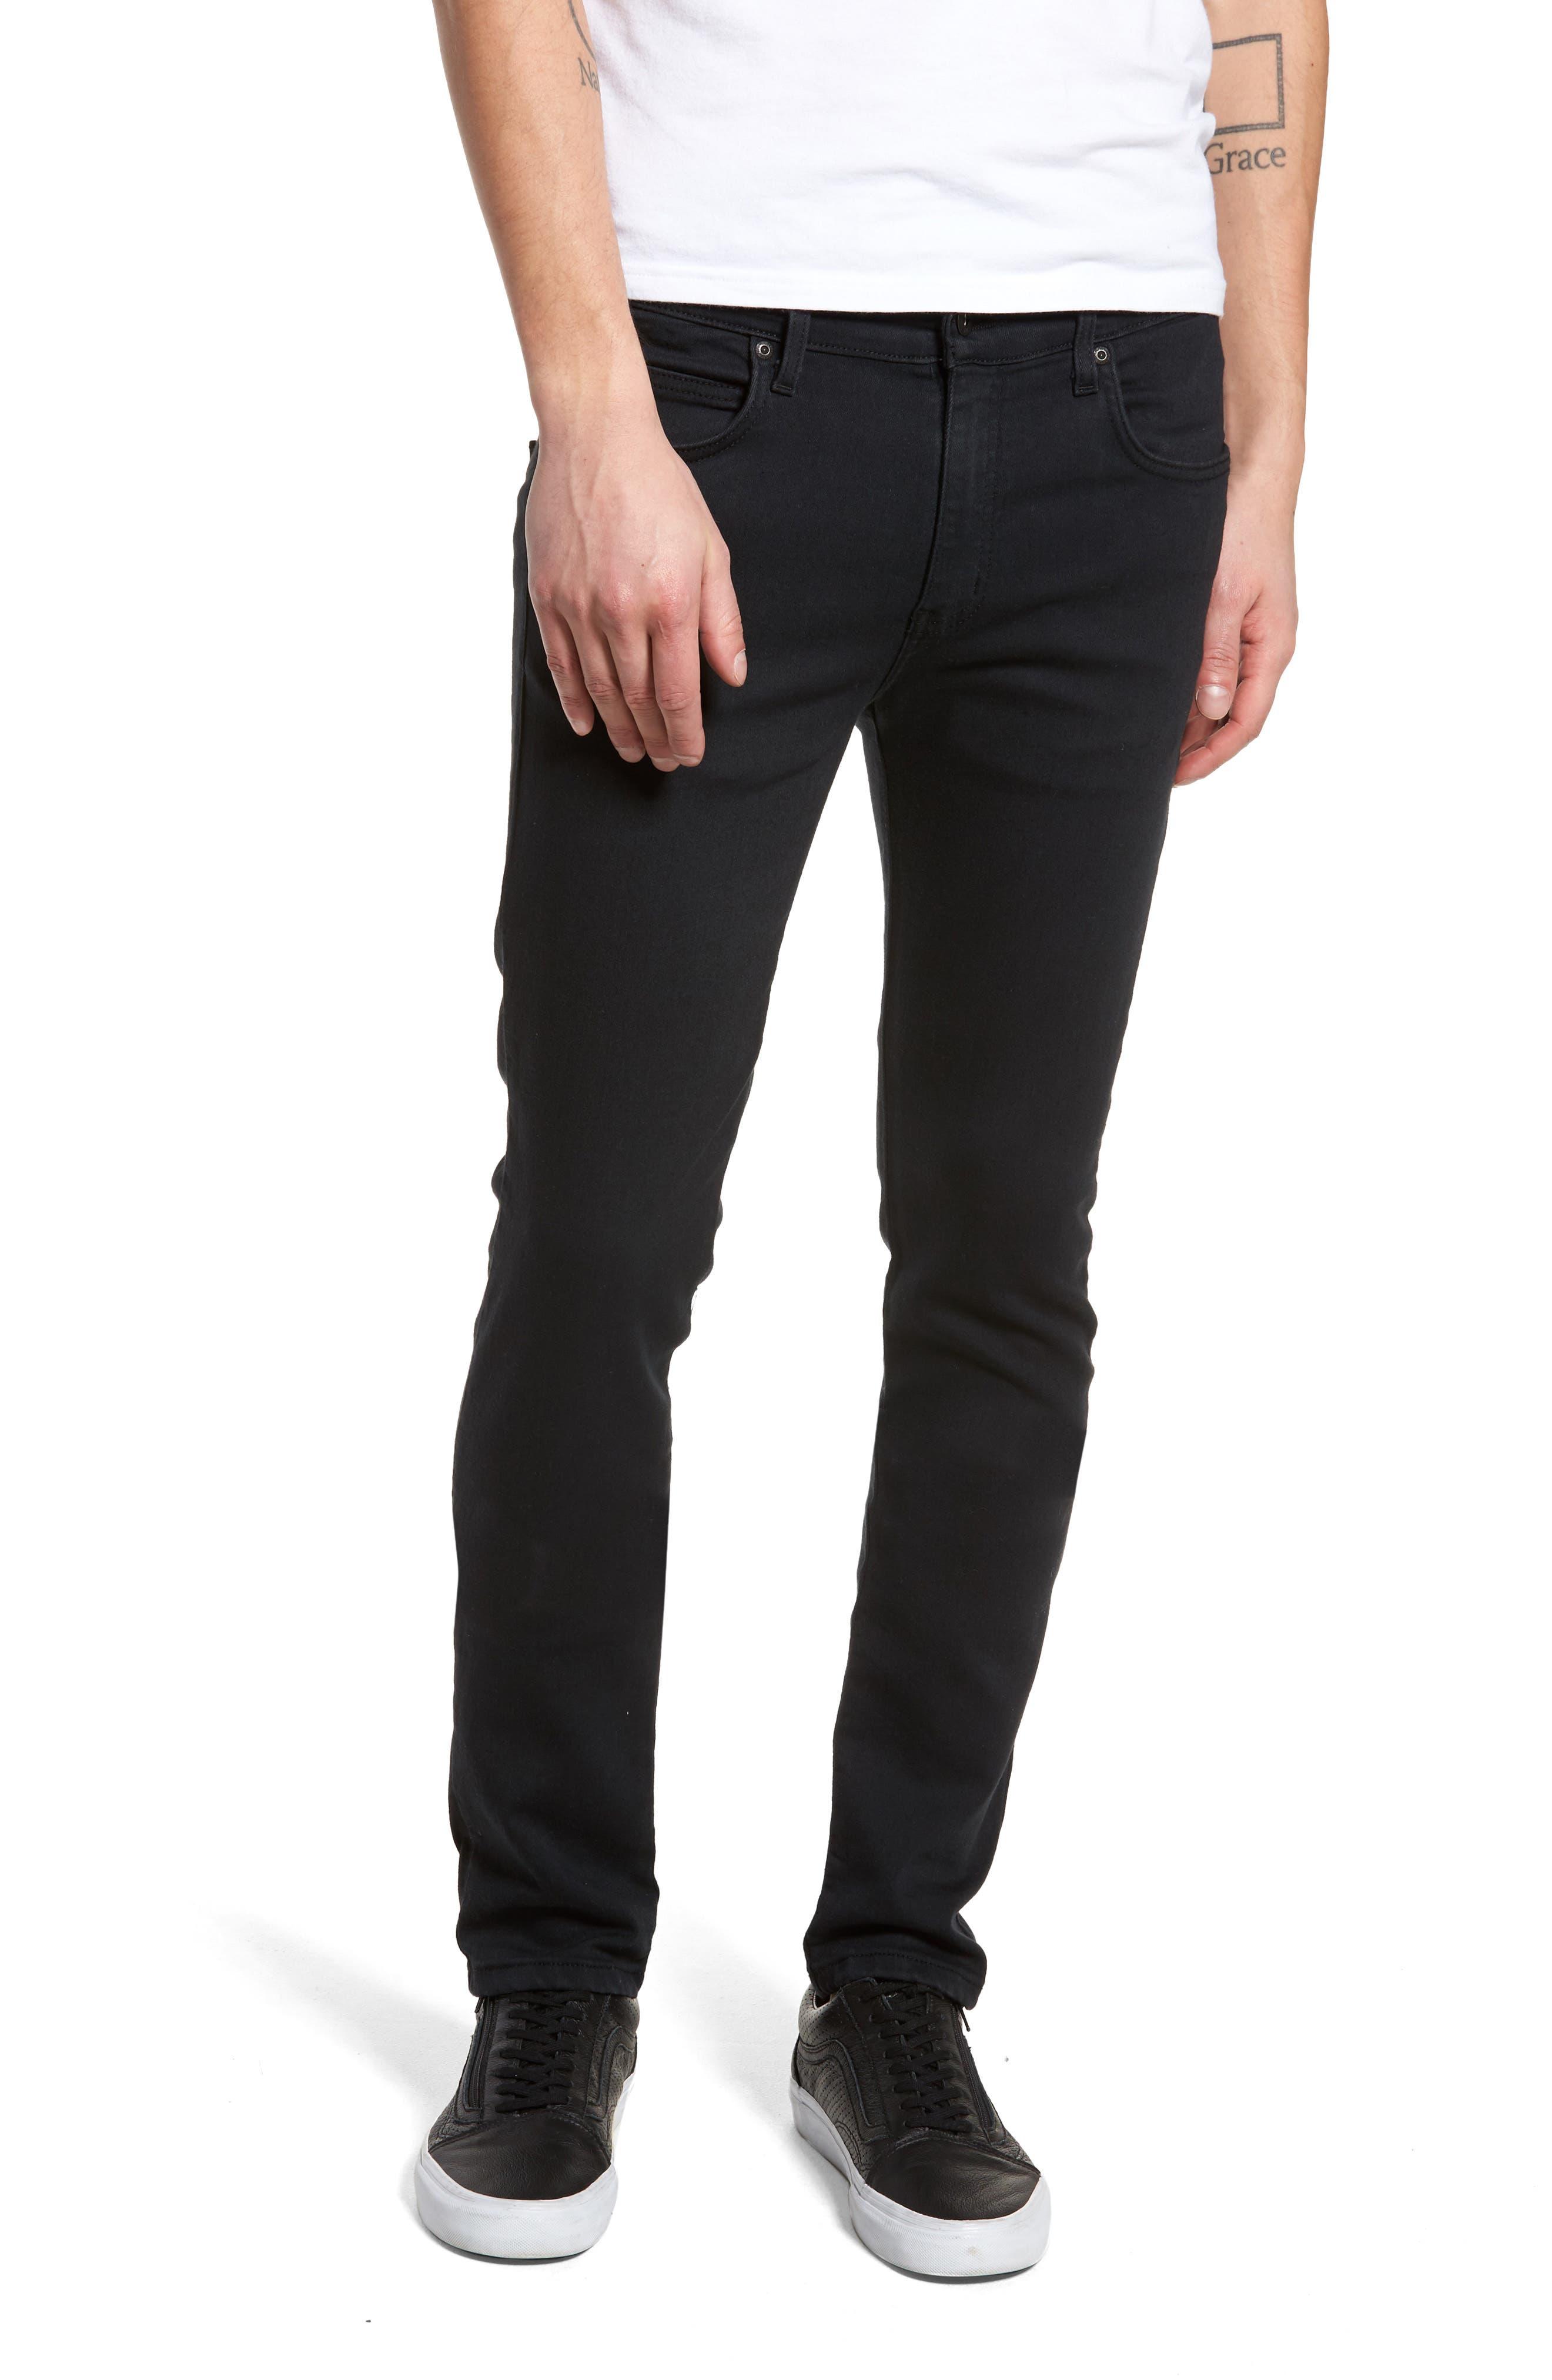 Super Skinny Guy Skinny Fit Jeans,                             Main thumbnail 1, color,                             Black